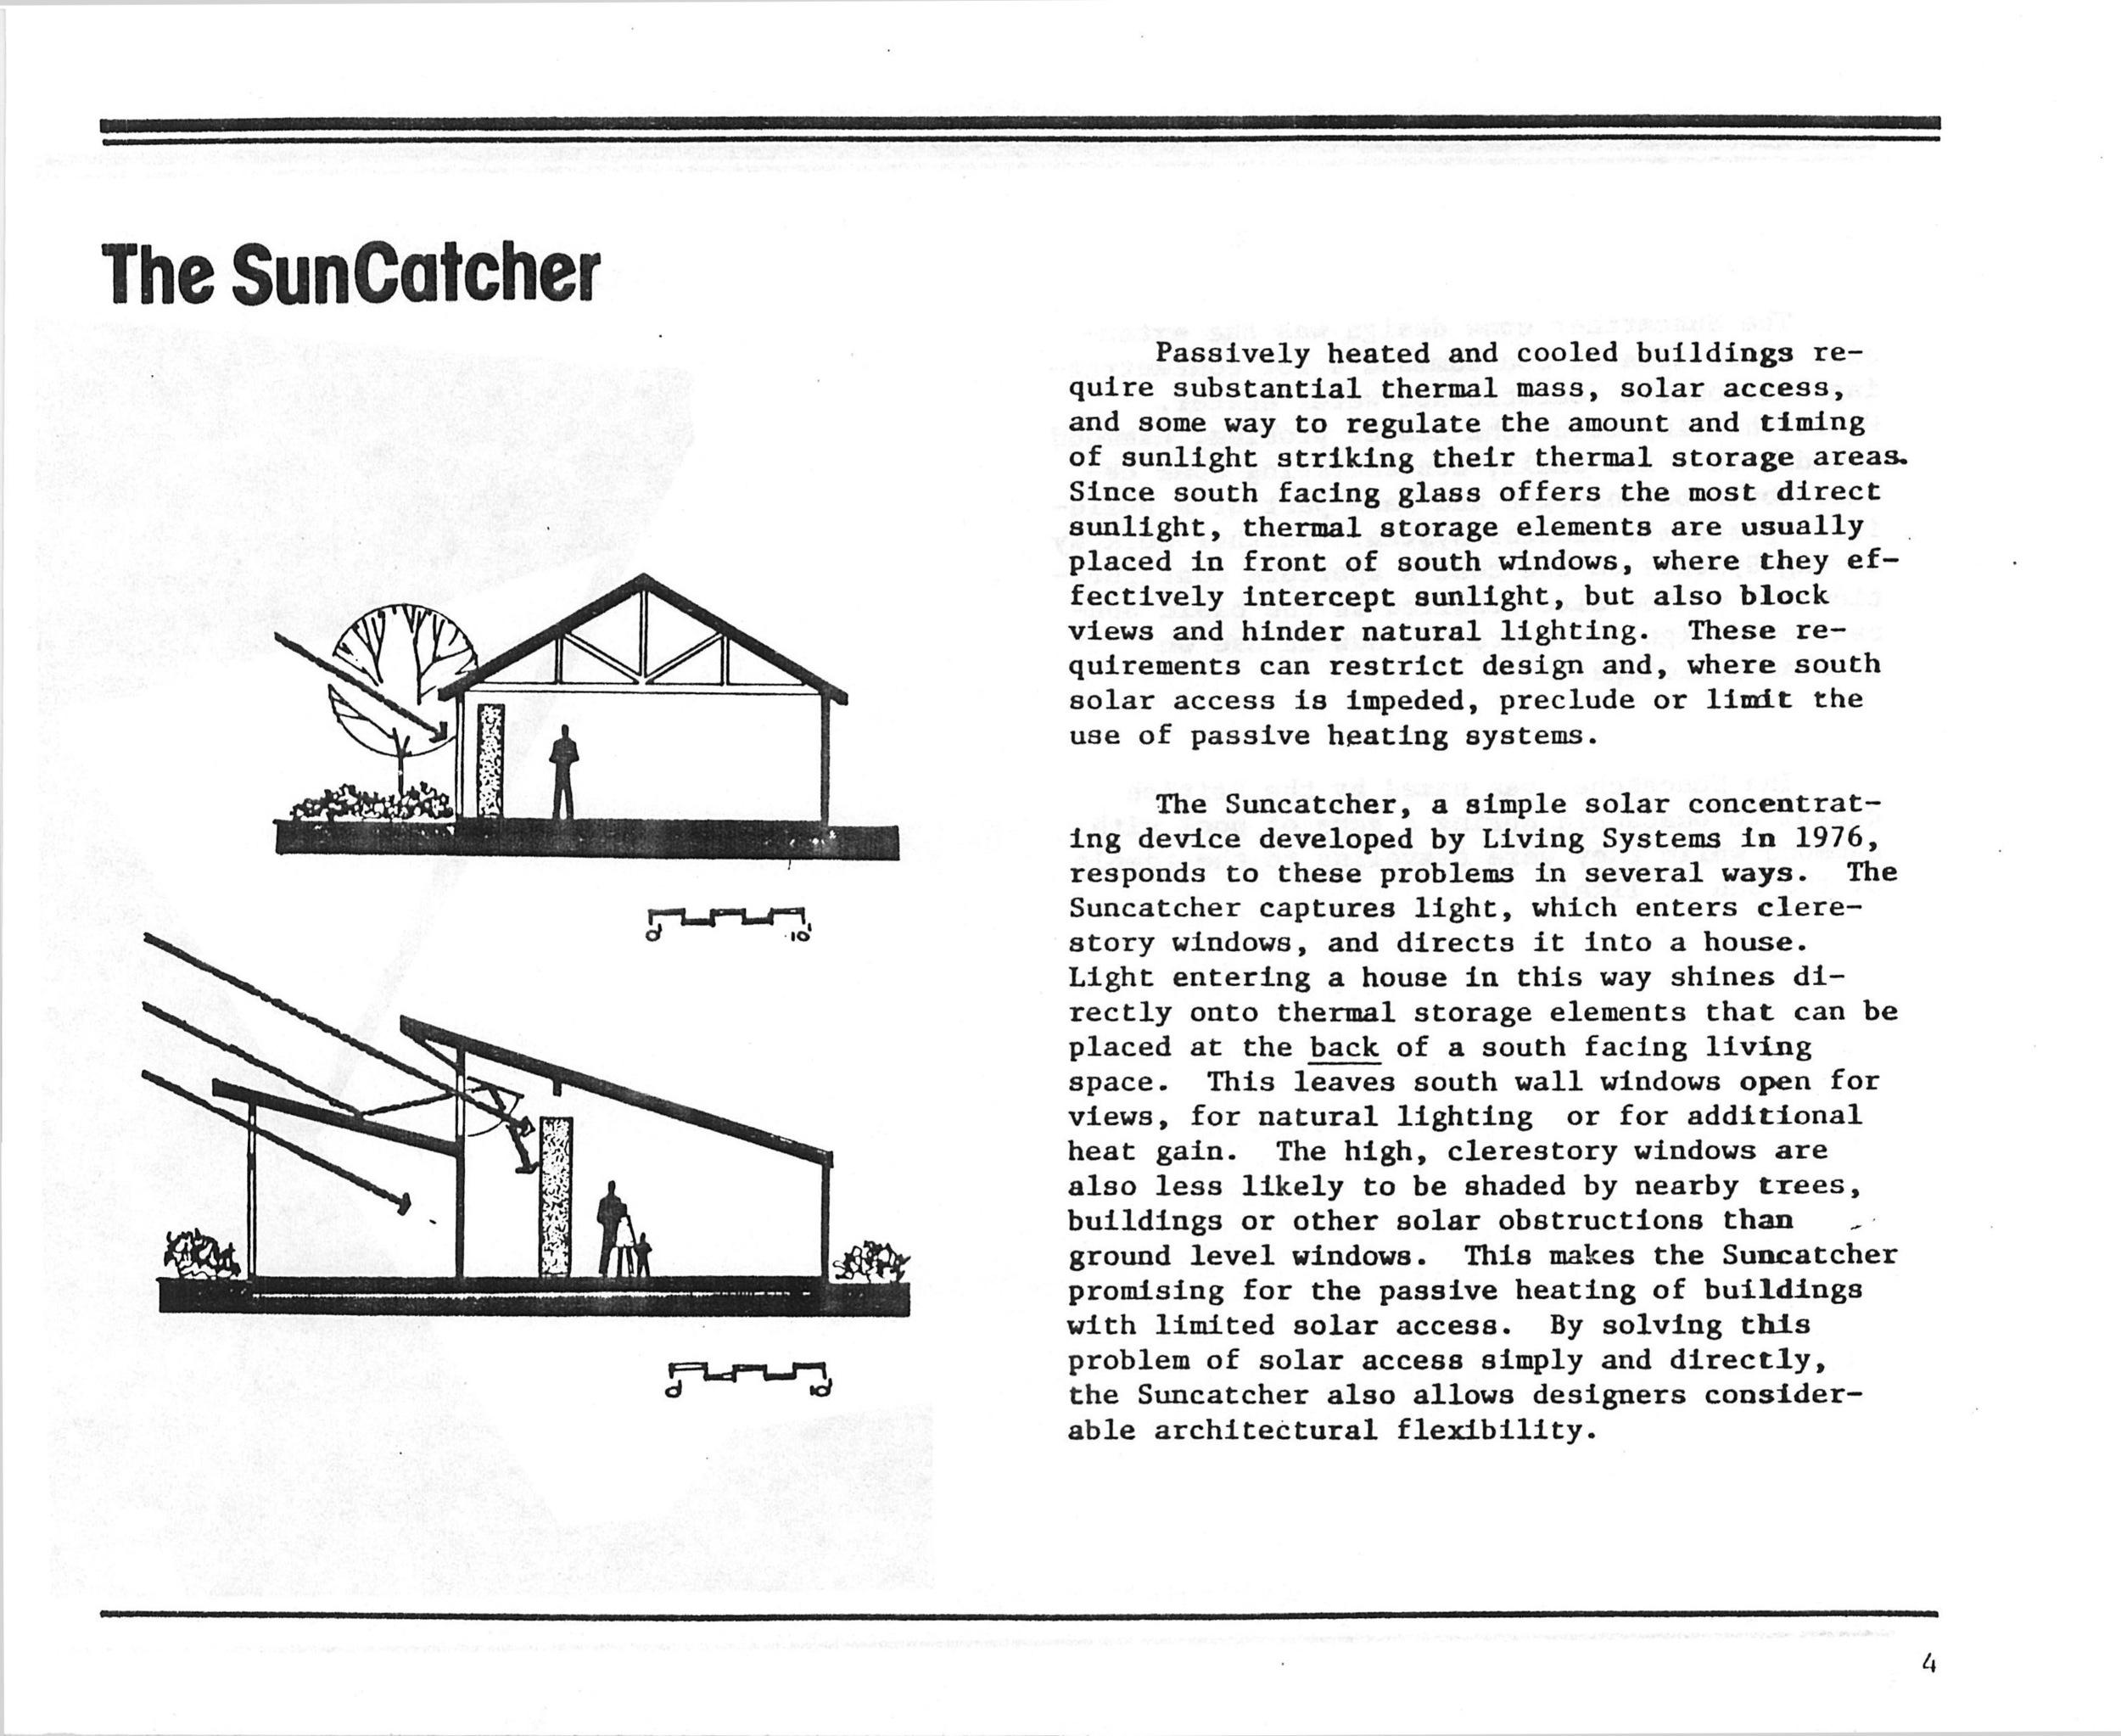 CoolPool-LivingSystems_1981_Page_007.jpg